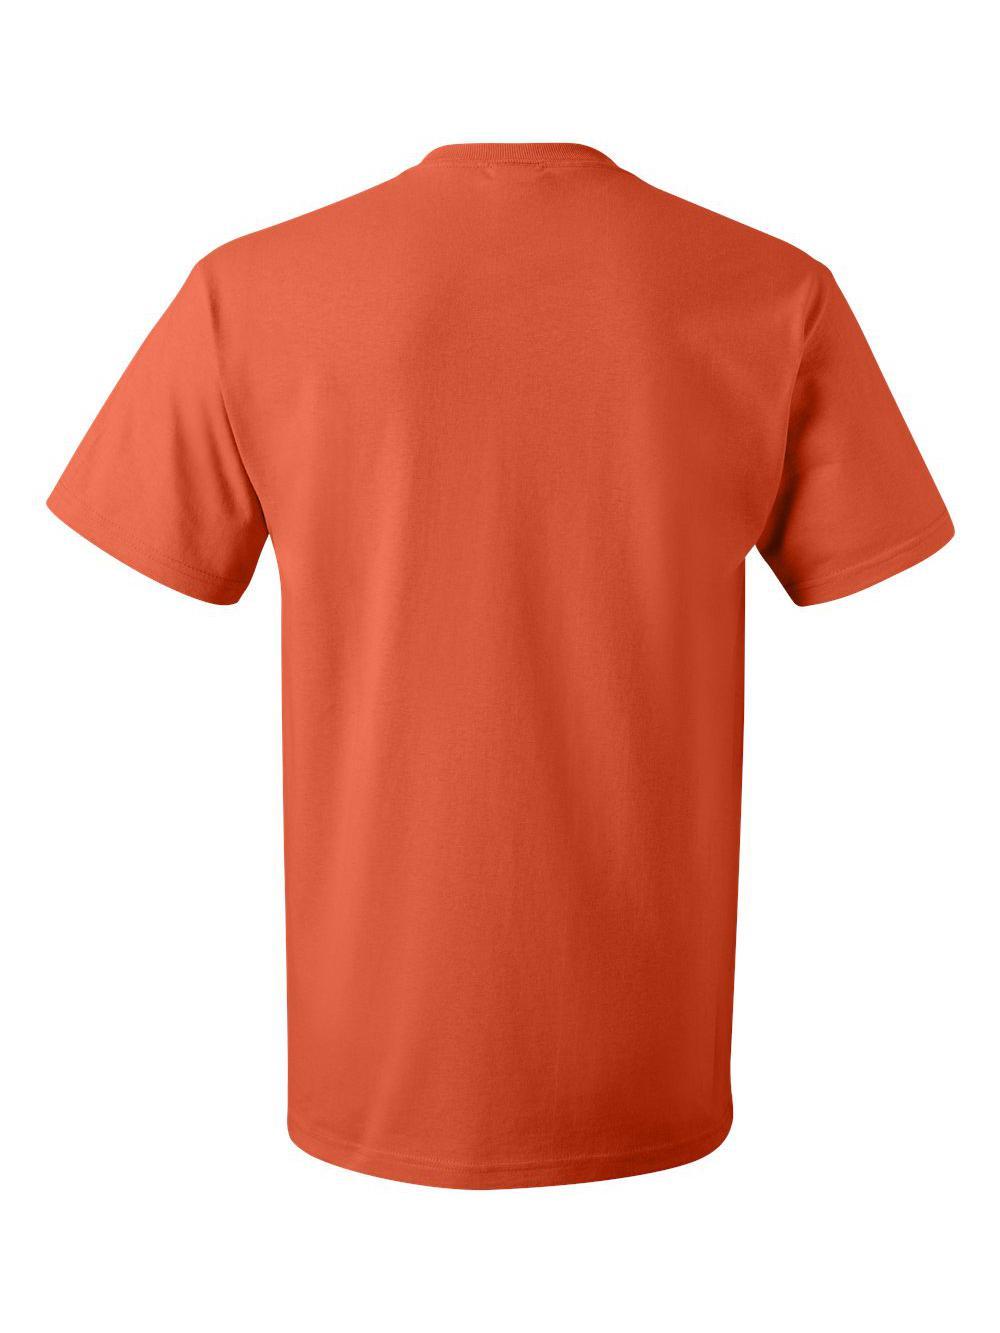 Fruit-of-the-Loom-HD-Cotton-Short-Sleeve-T-Shirt-3930R thumbnail 22